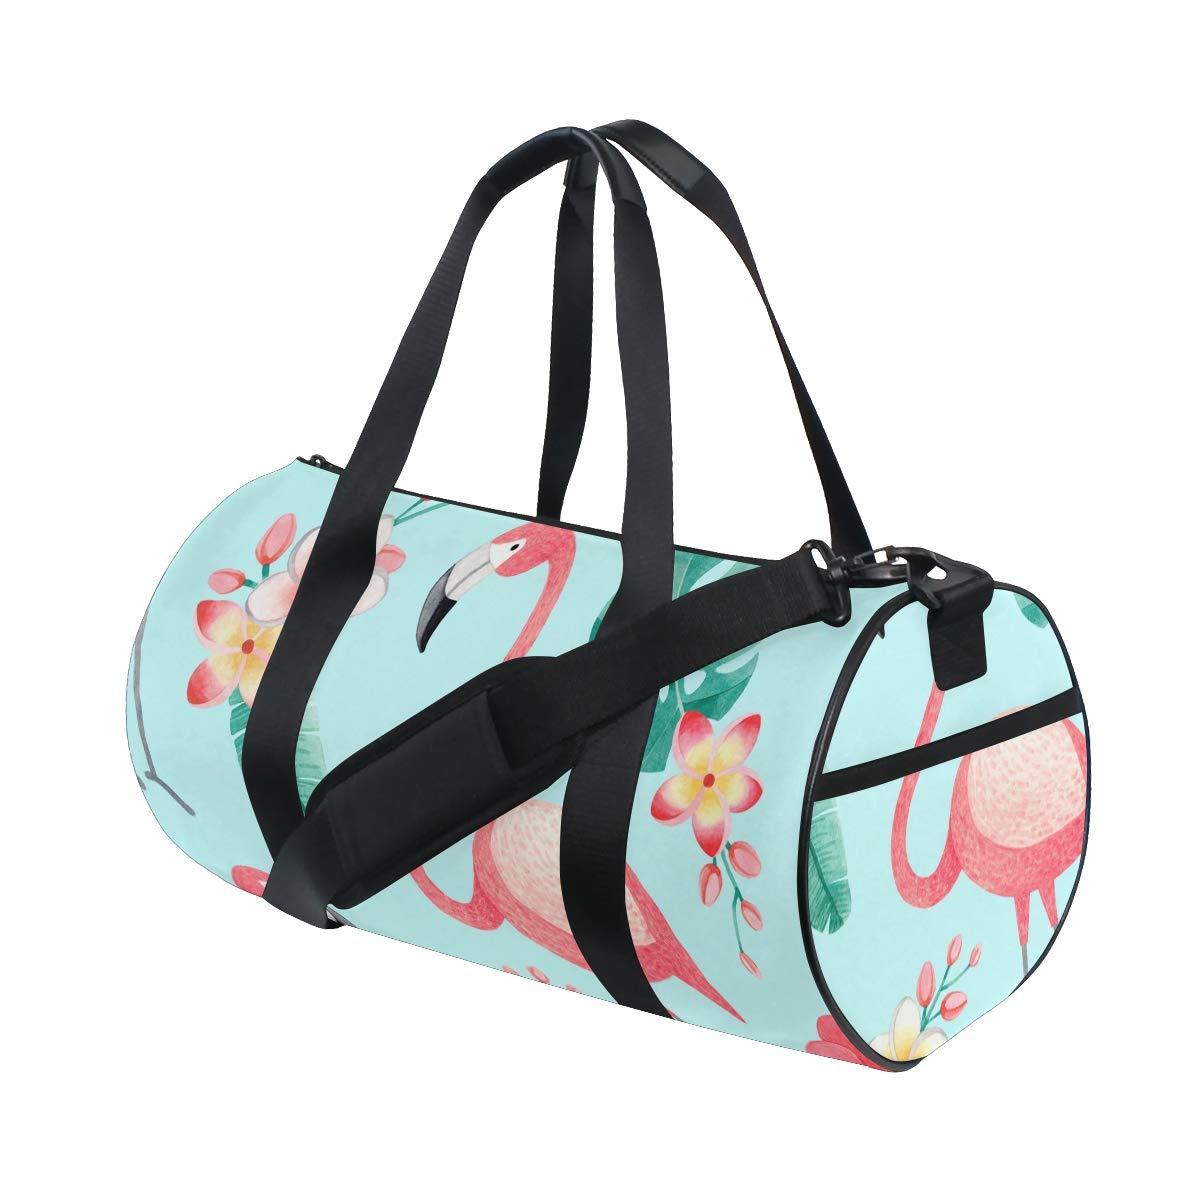 Flamingo Sports Gym Bag Travel Duffel Bag with Pockets Luggage & Travel Gear Shoulder Strap Fitness Bag